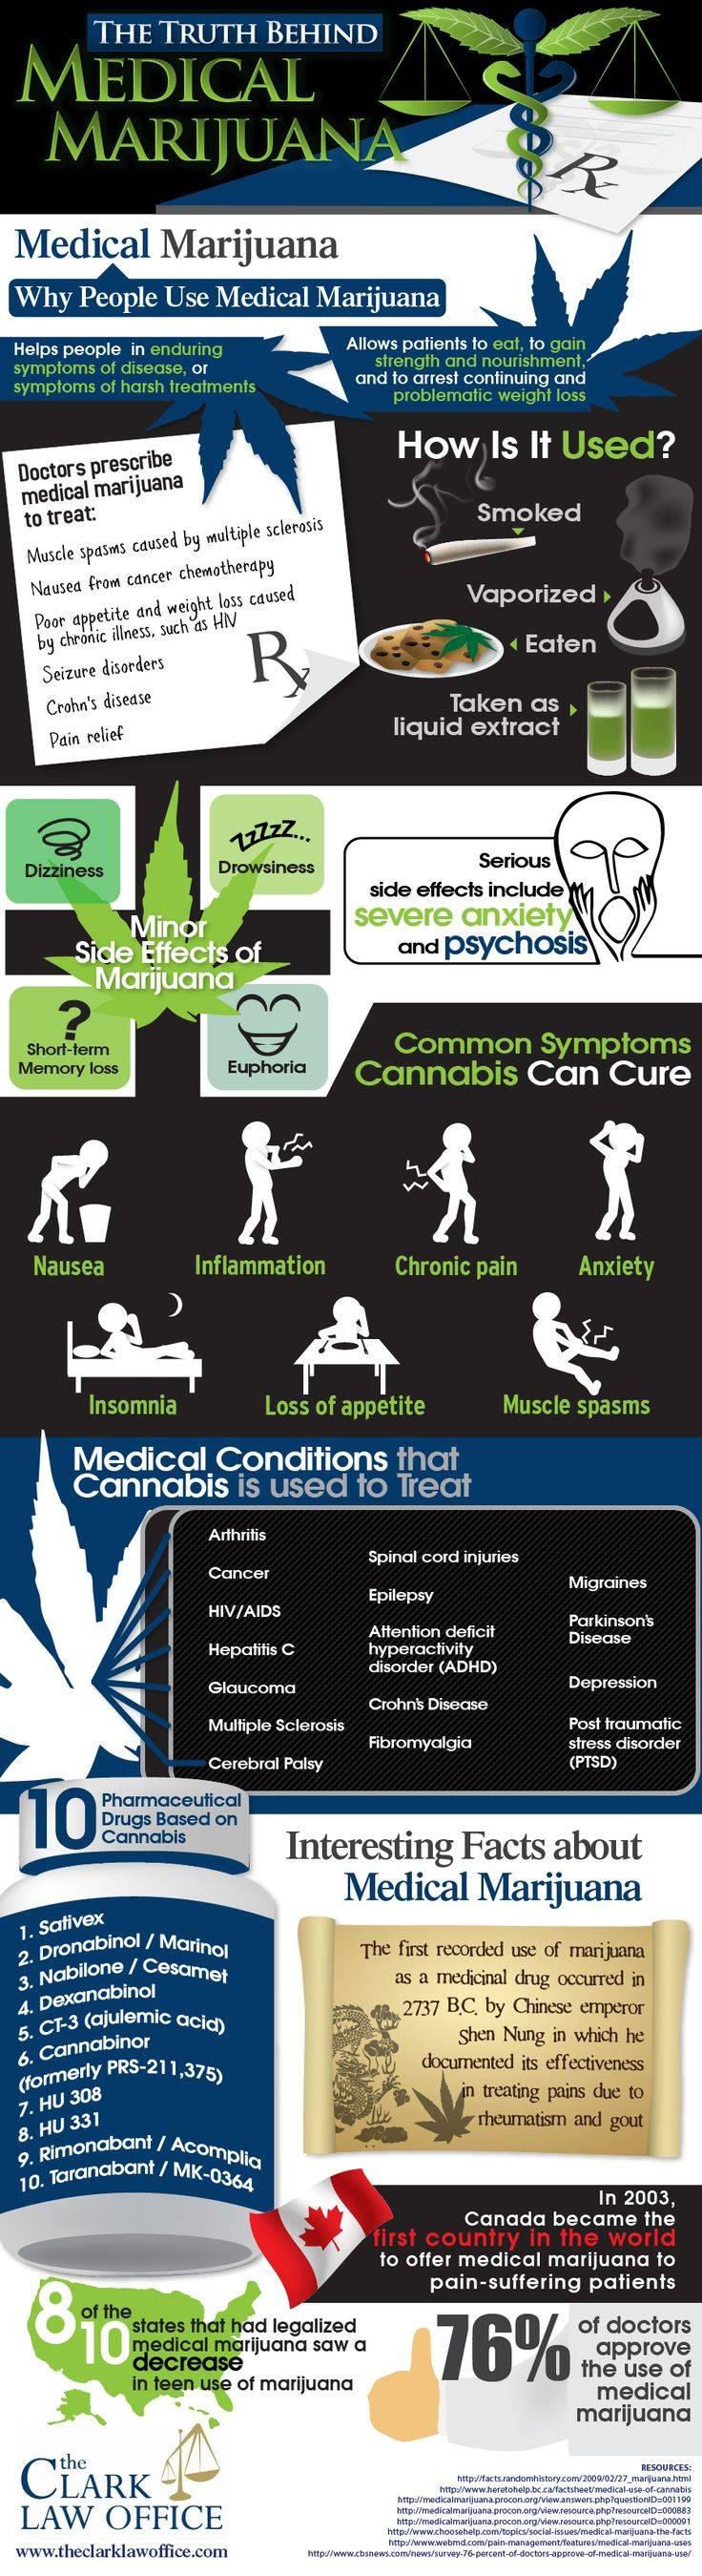 The Truth Behind Medical Marijuana